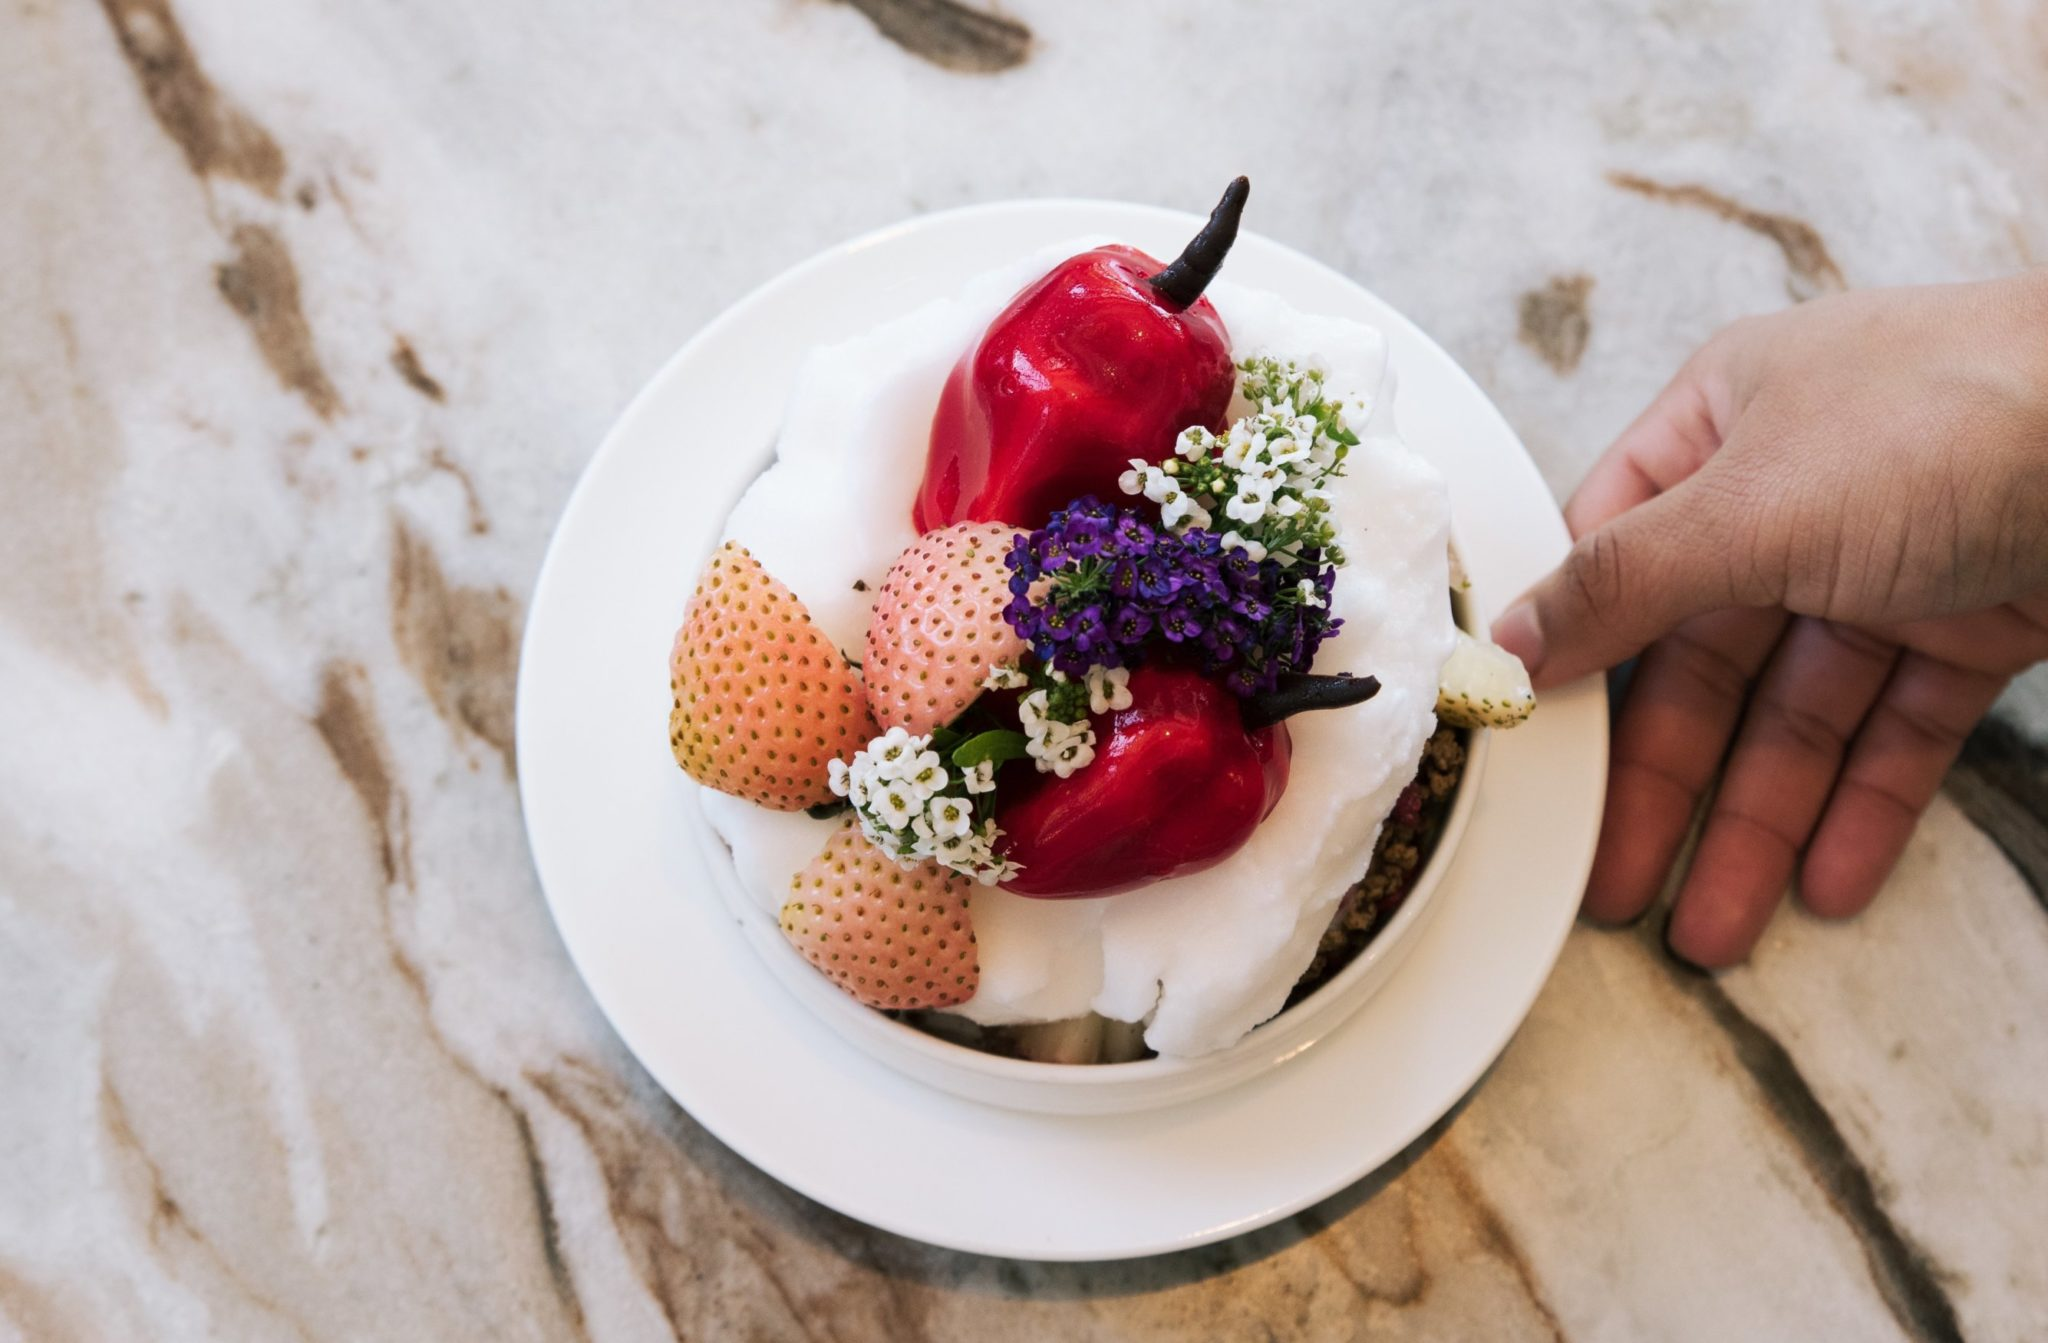 One of pastry chef Paola Velez's creations. Photo courtesy of Paola Velez.